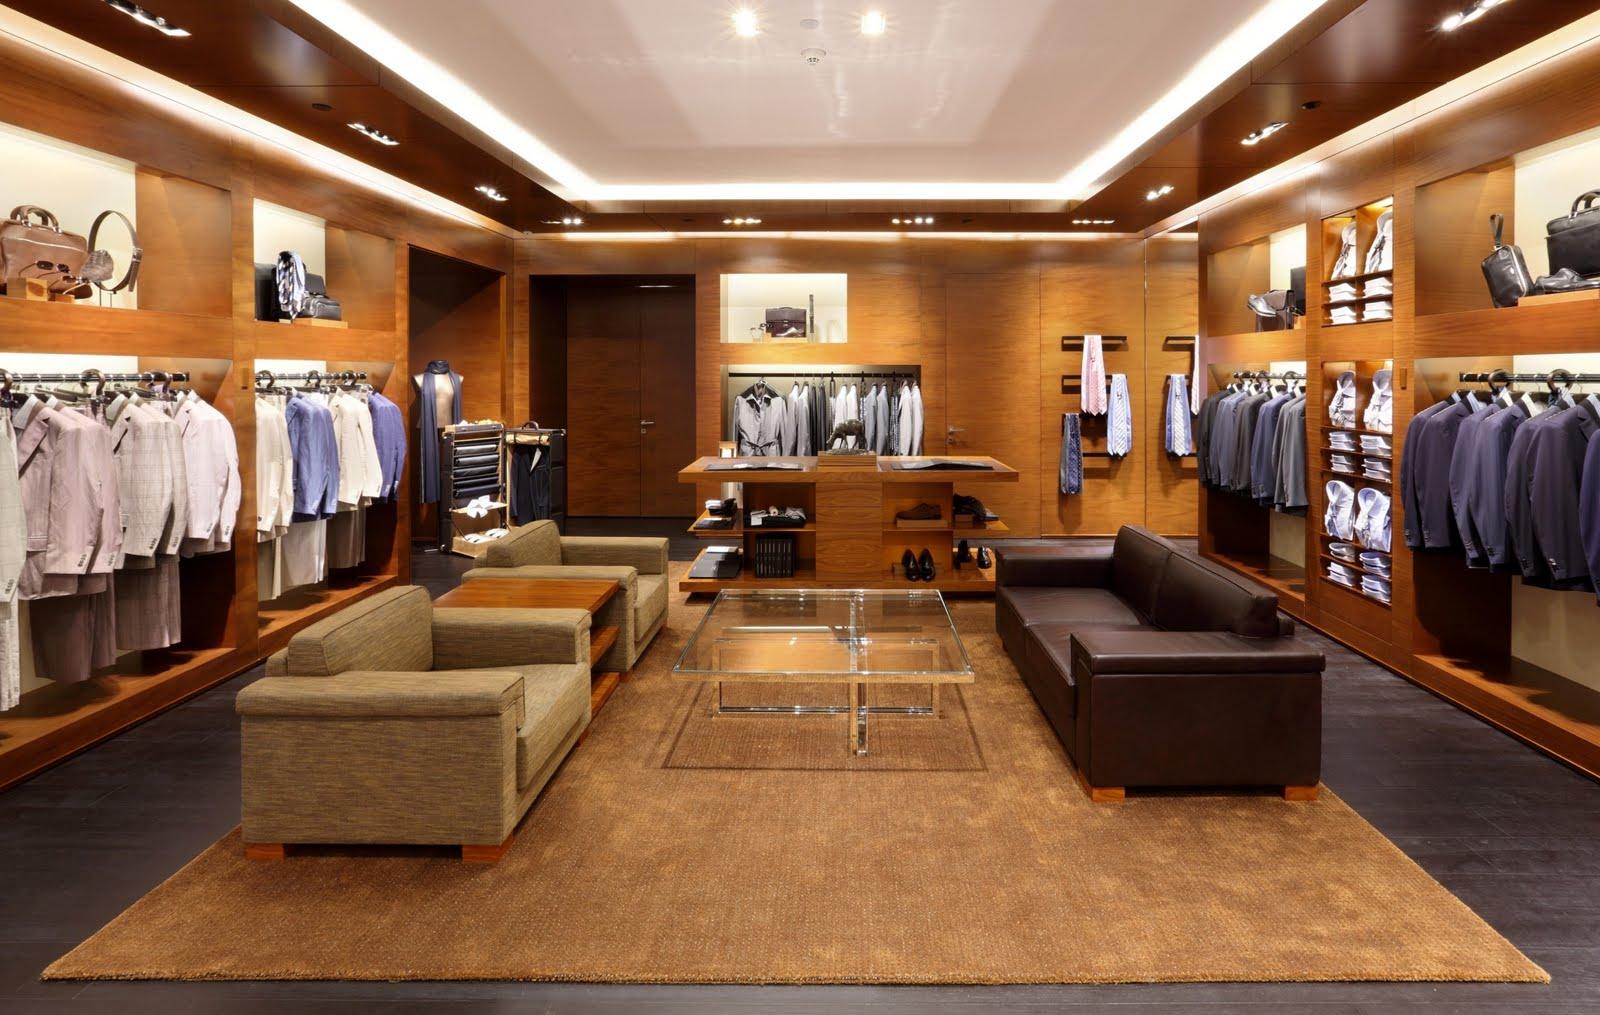 c6285e7a5aa11 Ermenegildo Zegna Shanghai Global Store - Designed by Architect Peter Marino